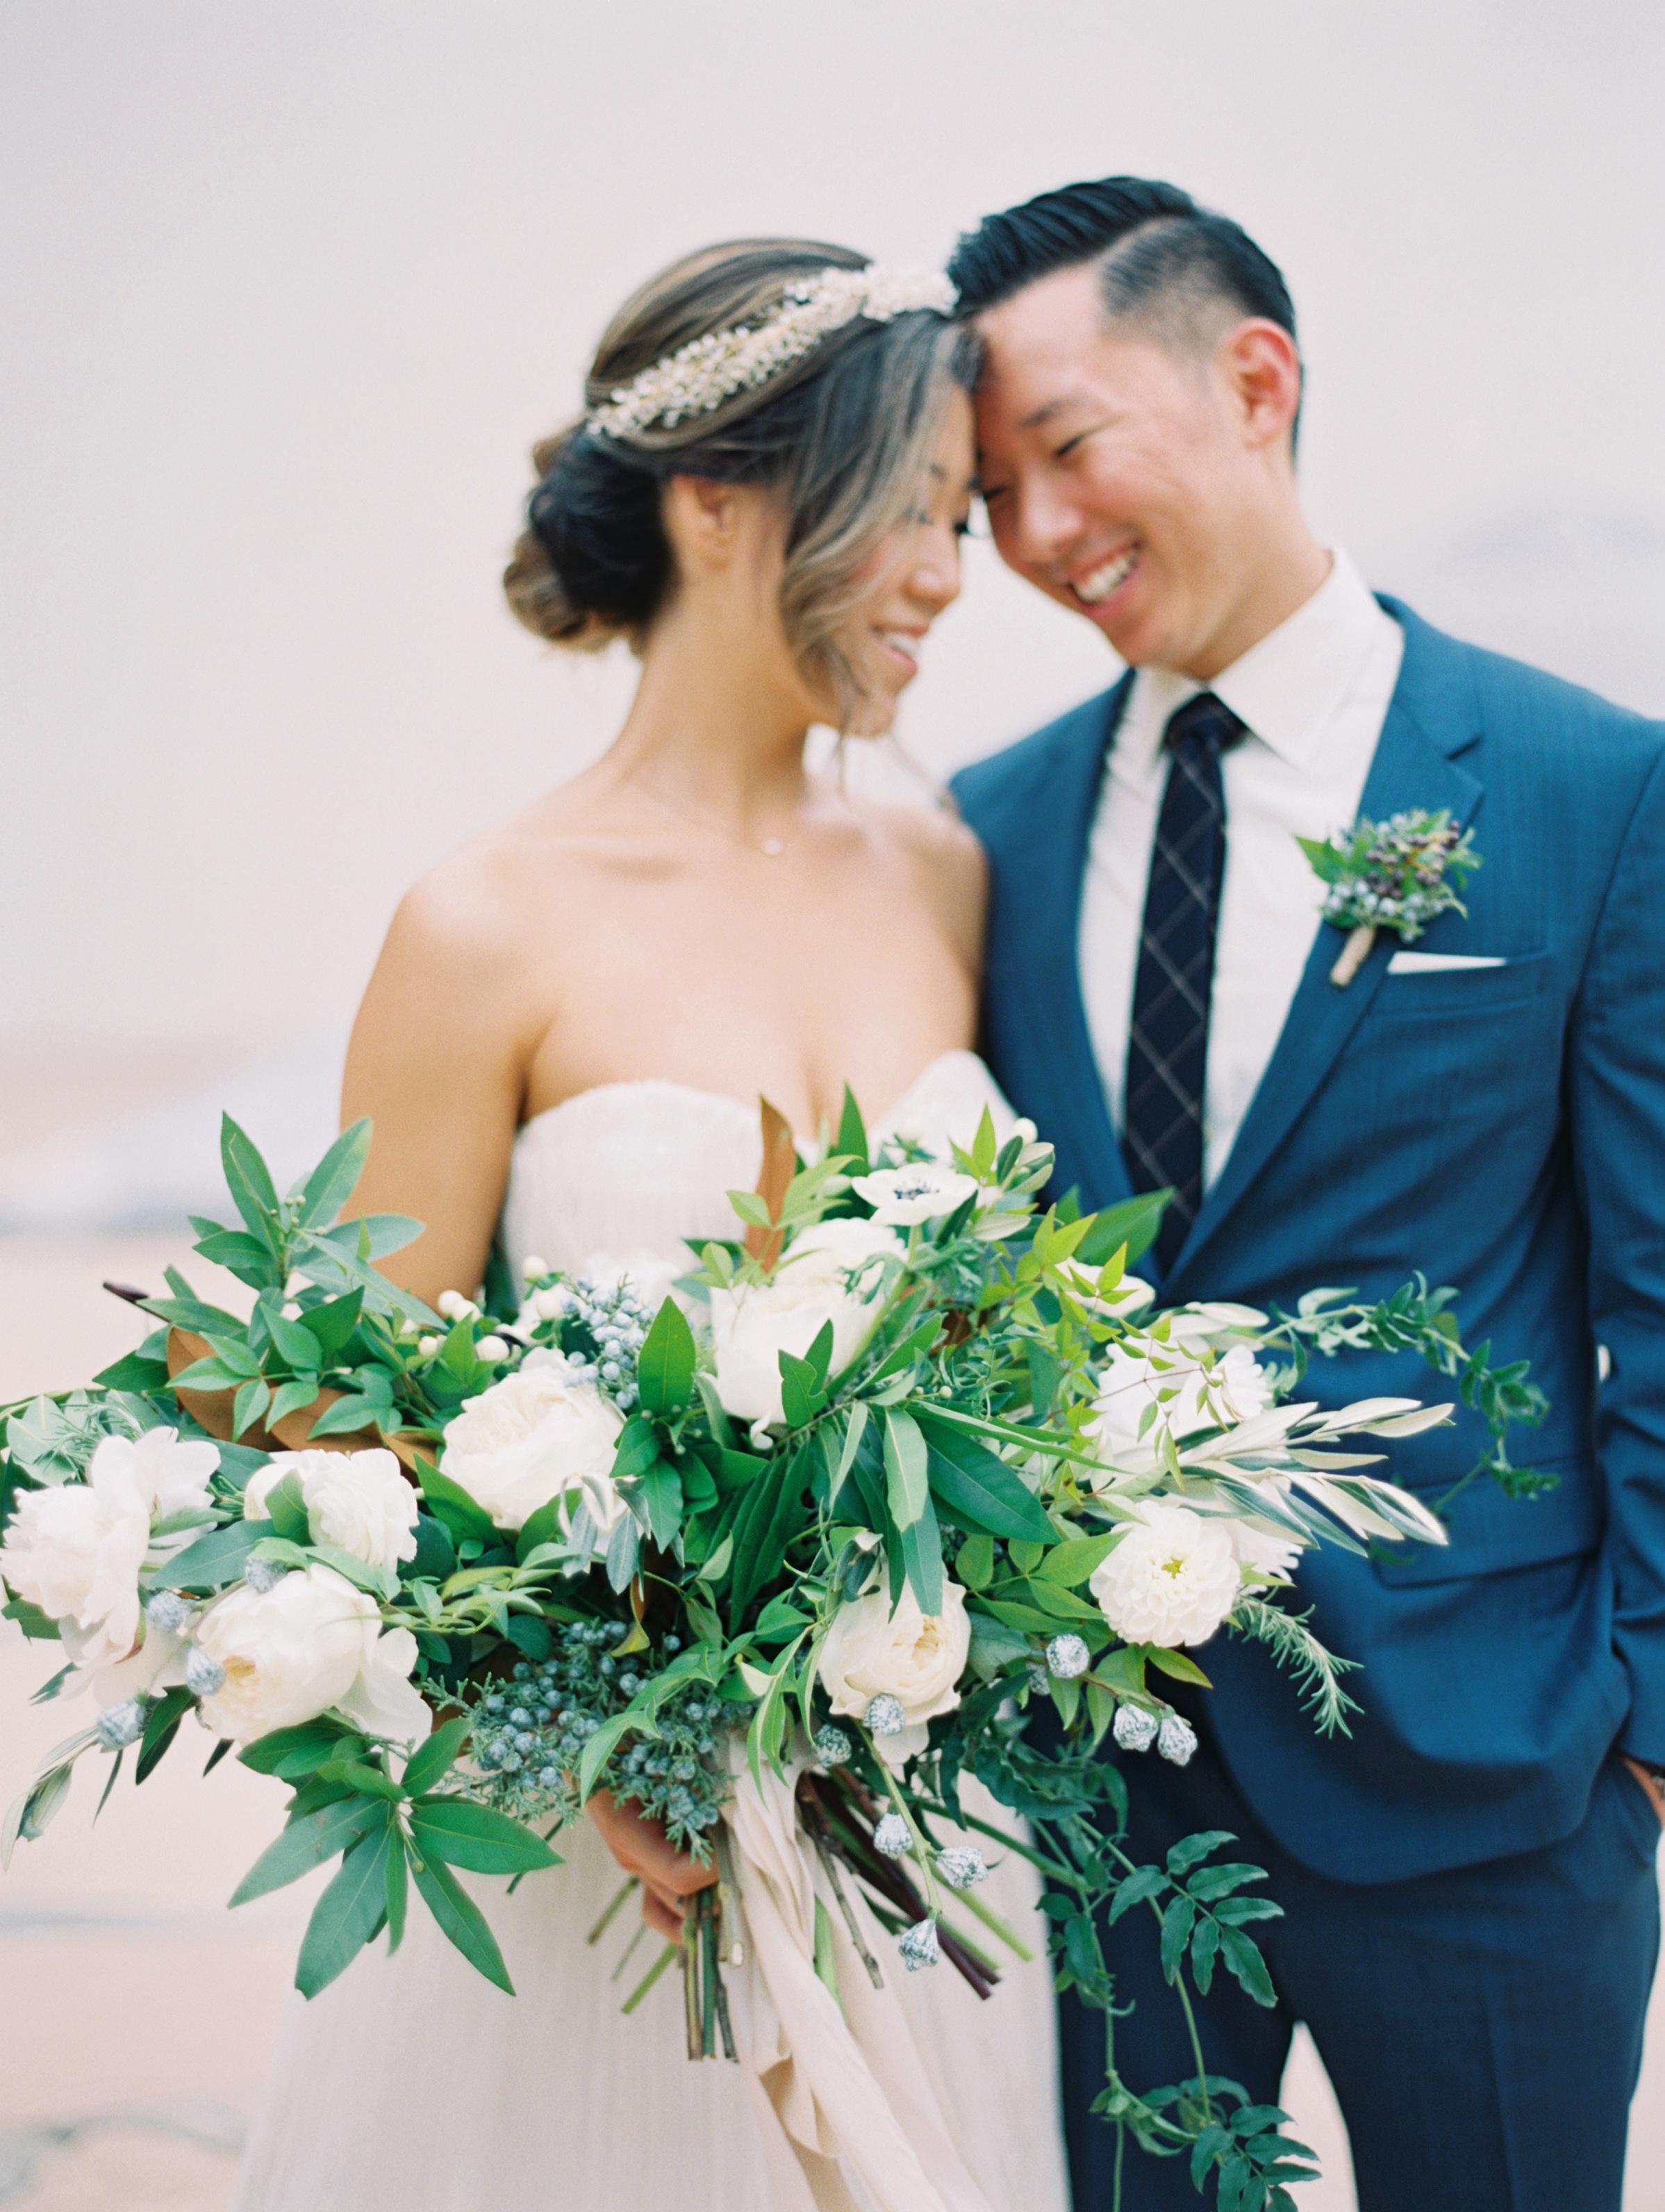 Featured on MOD WEDDING